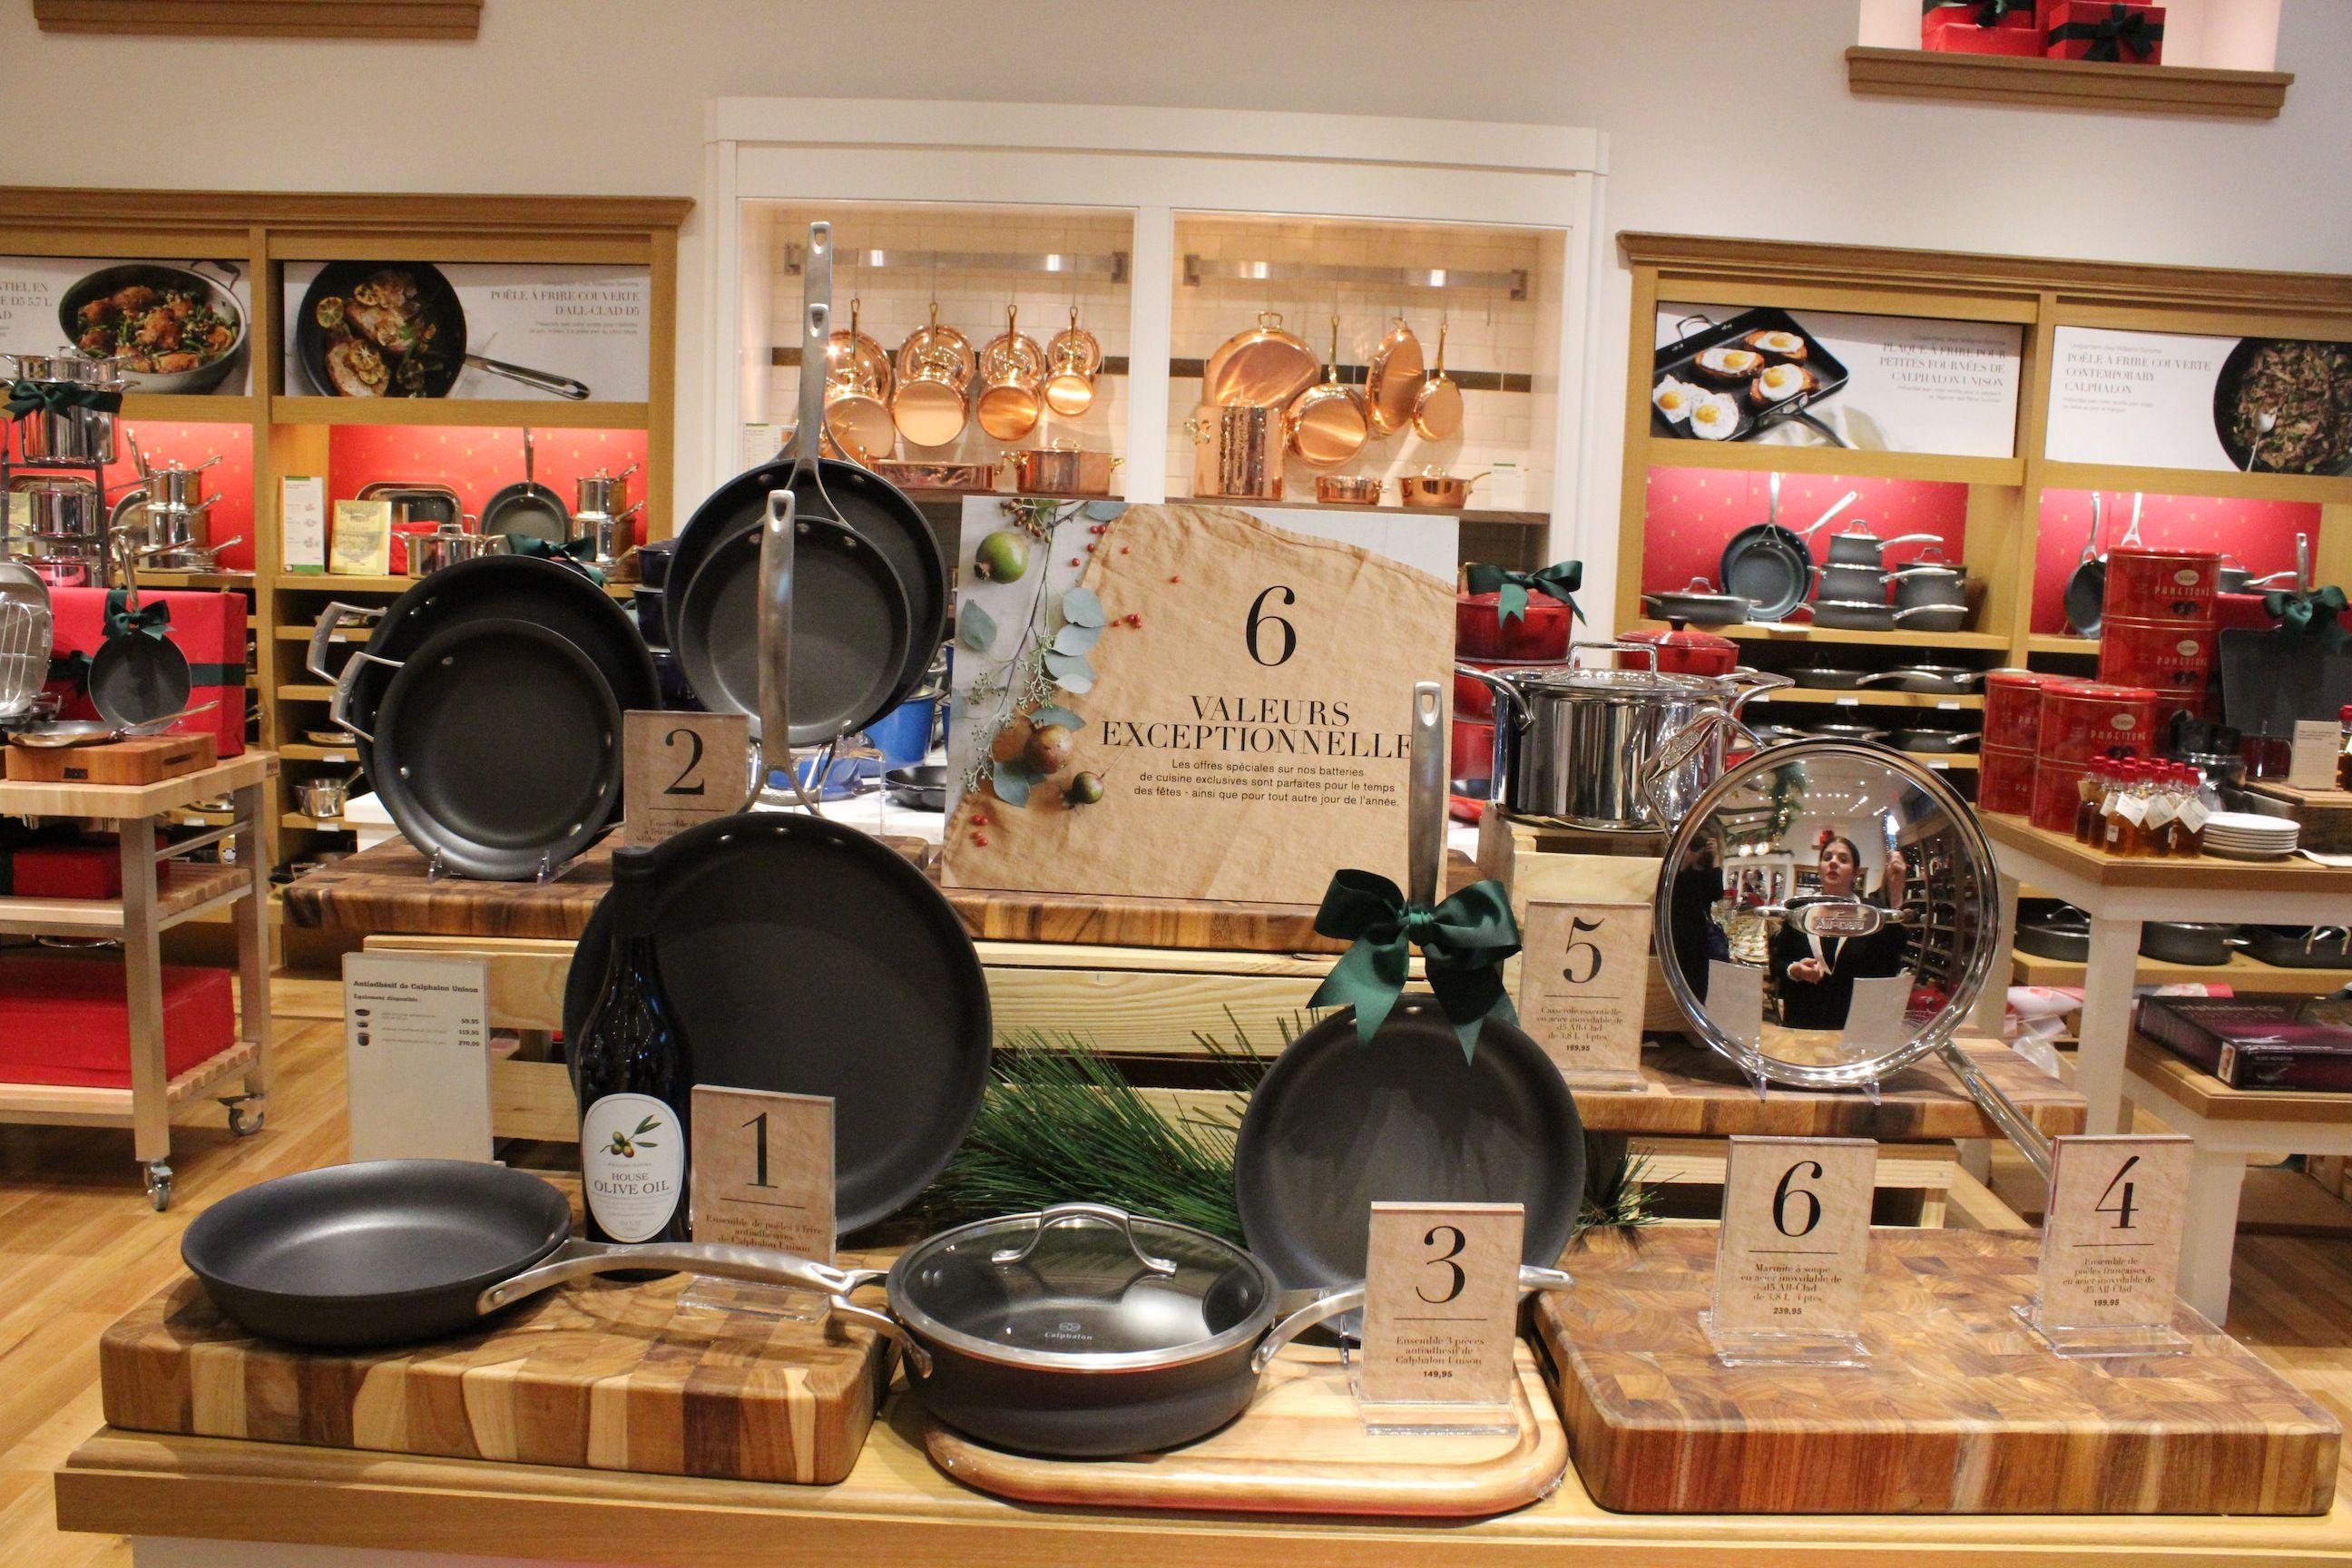 William Sonoma Table Arrangement Kitchen Store Kitchen Table Table Arrangements